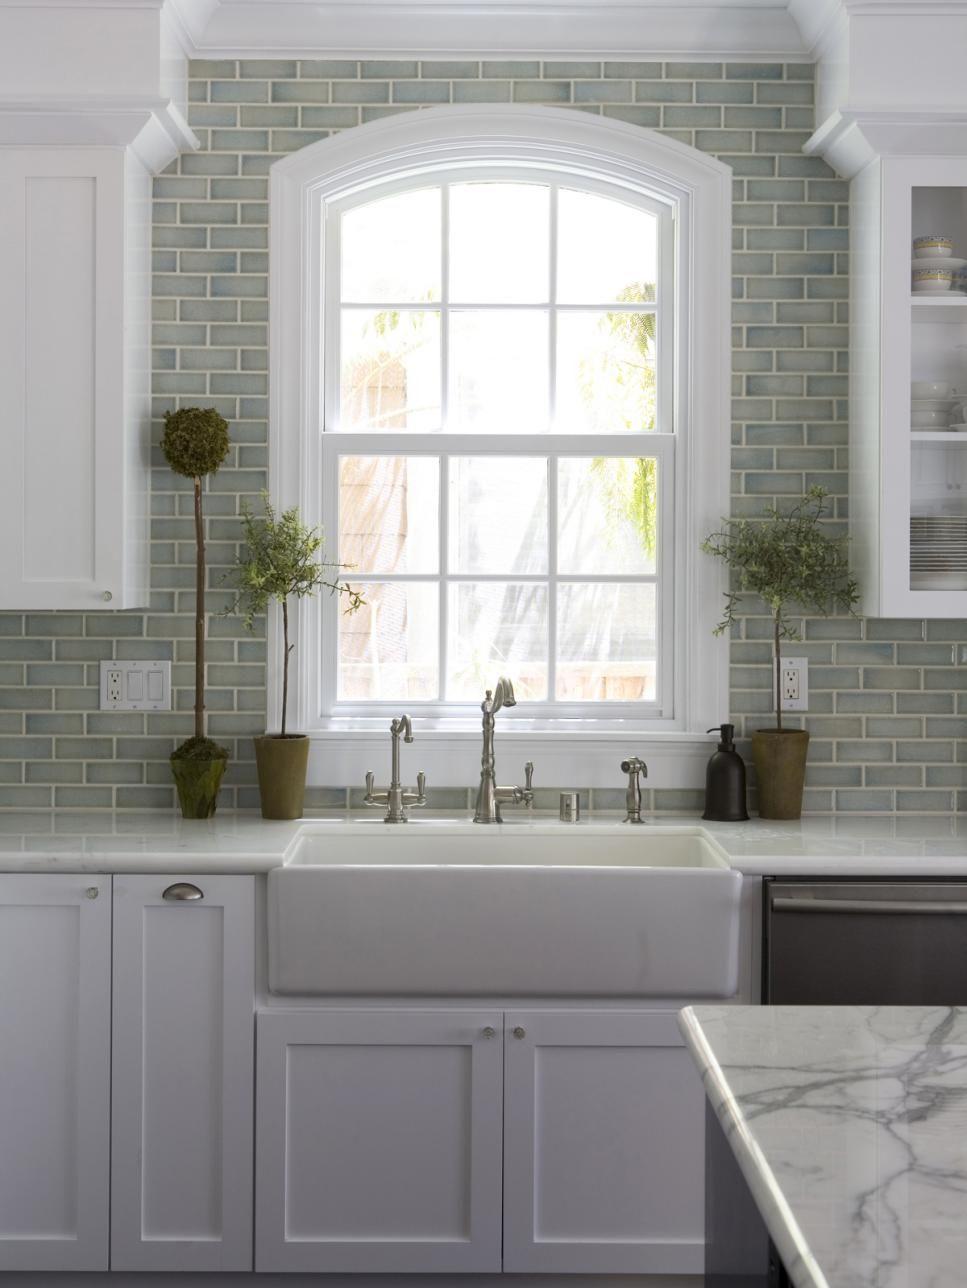 Pictures of Kitchen Backsplash Ideas From | Backsplash ideas ...